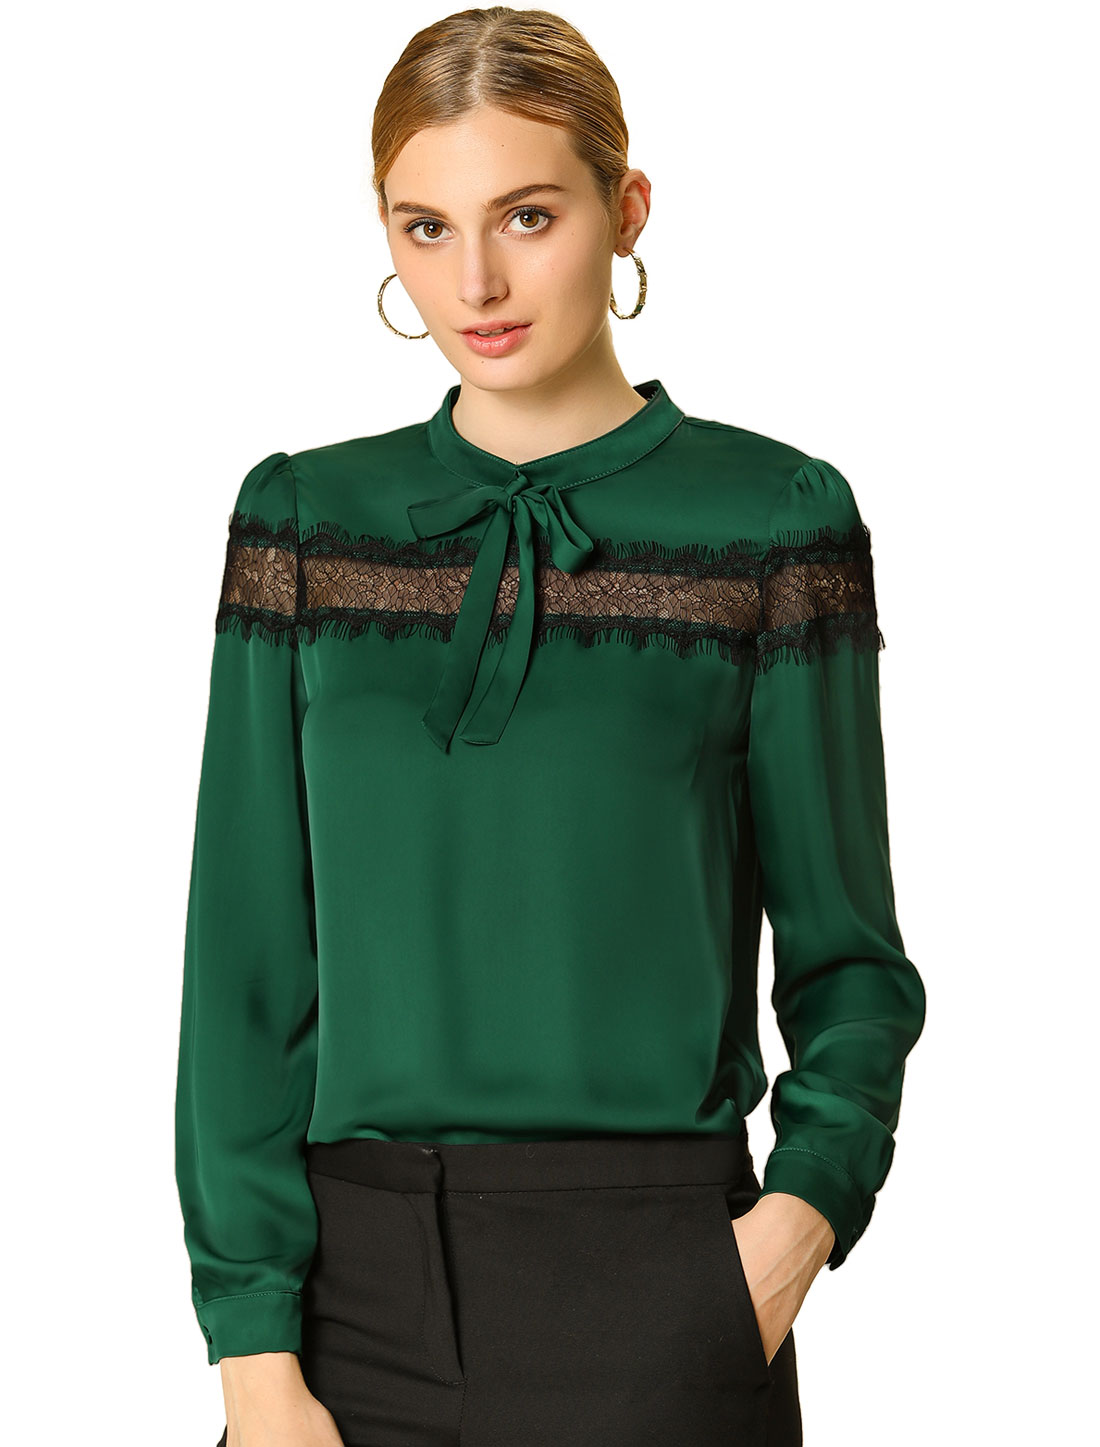 Allegra K Women's Elegant Long Sleeve Tie Neck Shirt Lace Patchwork Top Green M